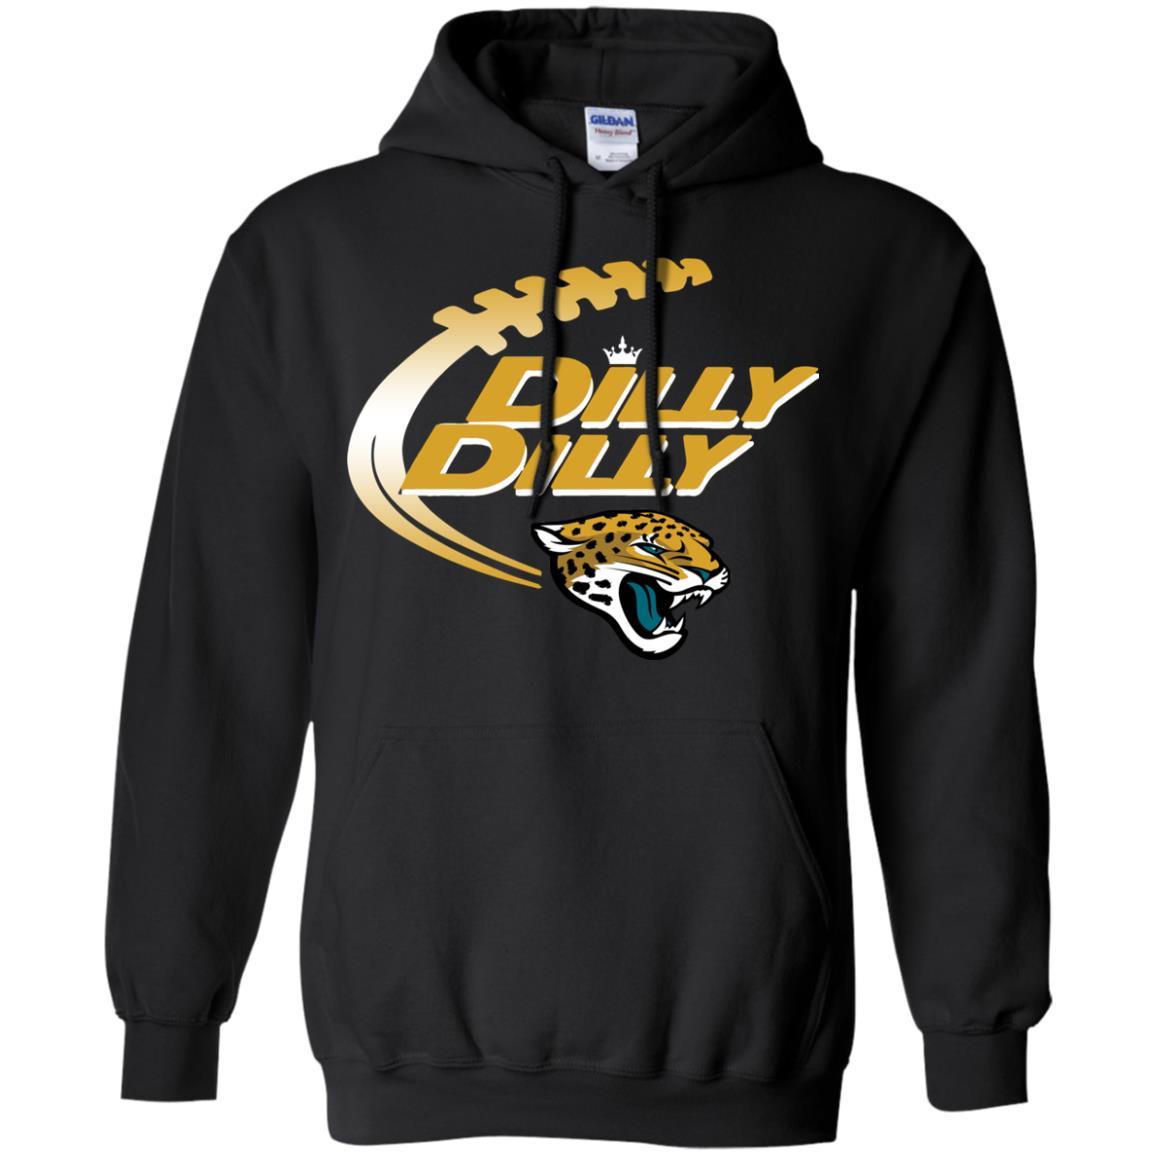 shirts white normal men s clothing jaguar mens preseason gallery for nike polo in jacksonville product lyst jaguars